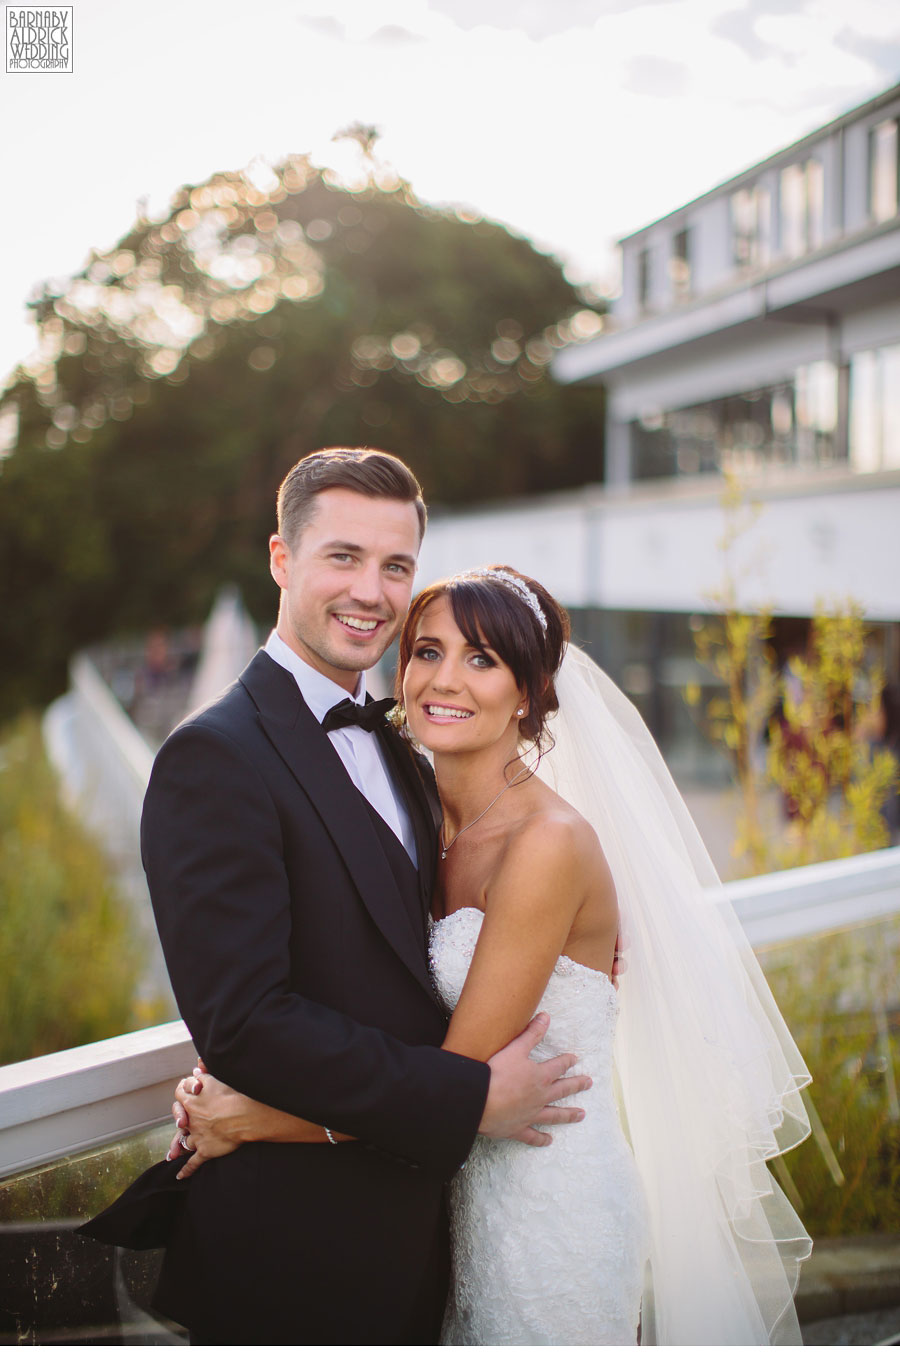 Casa Elland Yorkshire Wedding Photography 039